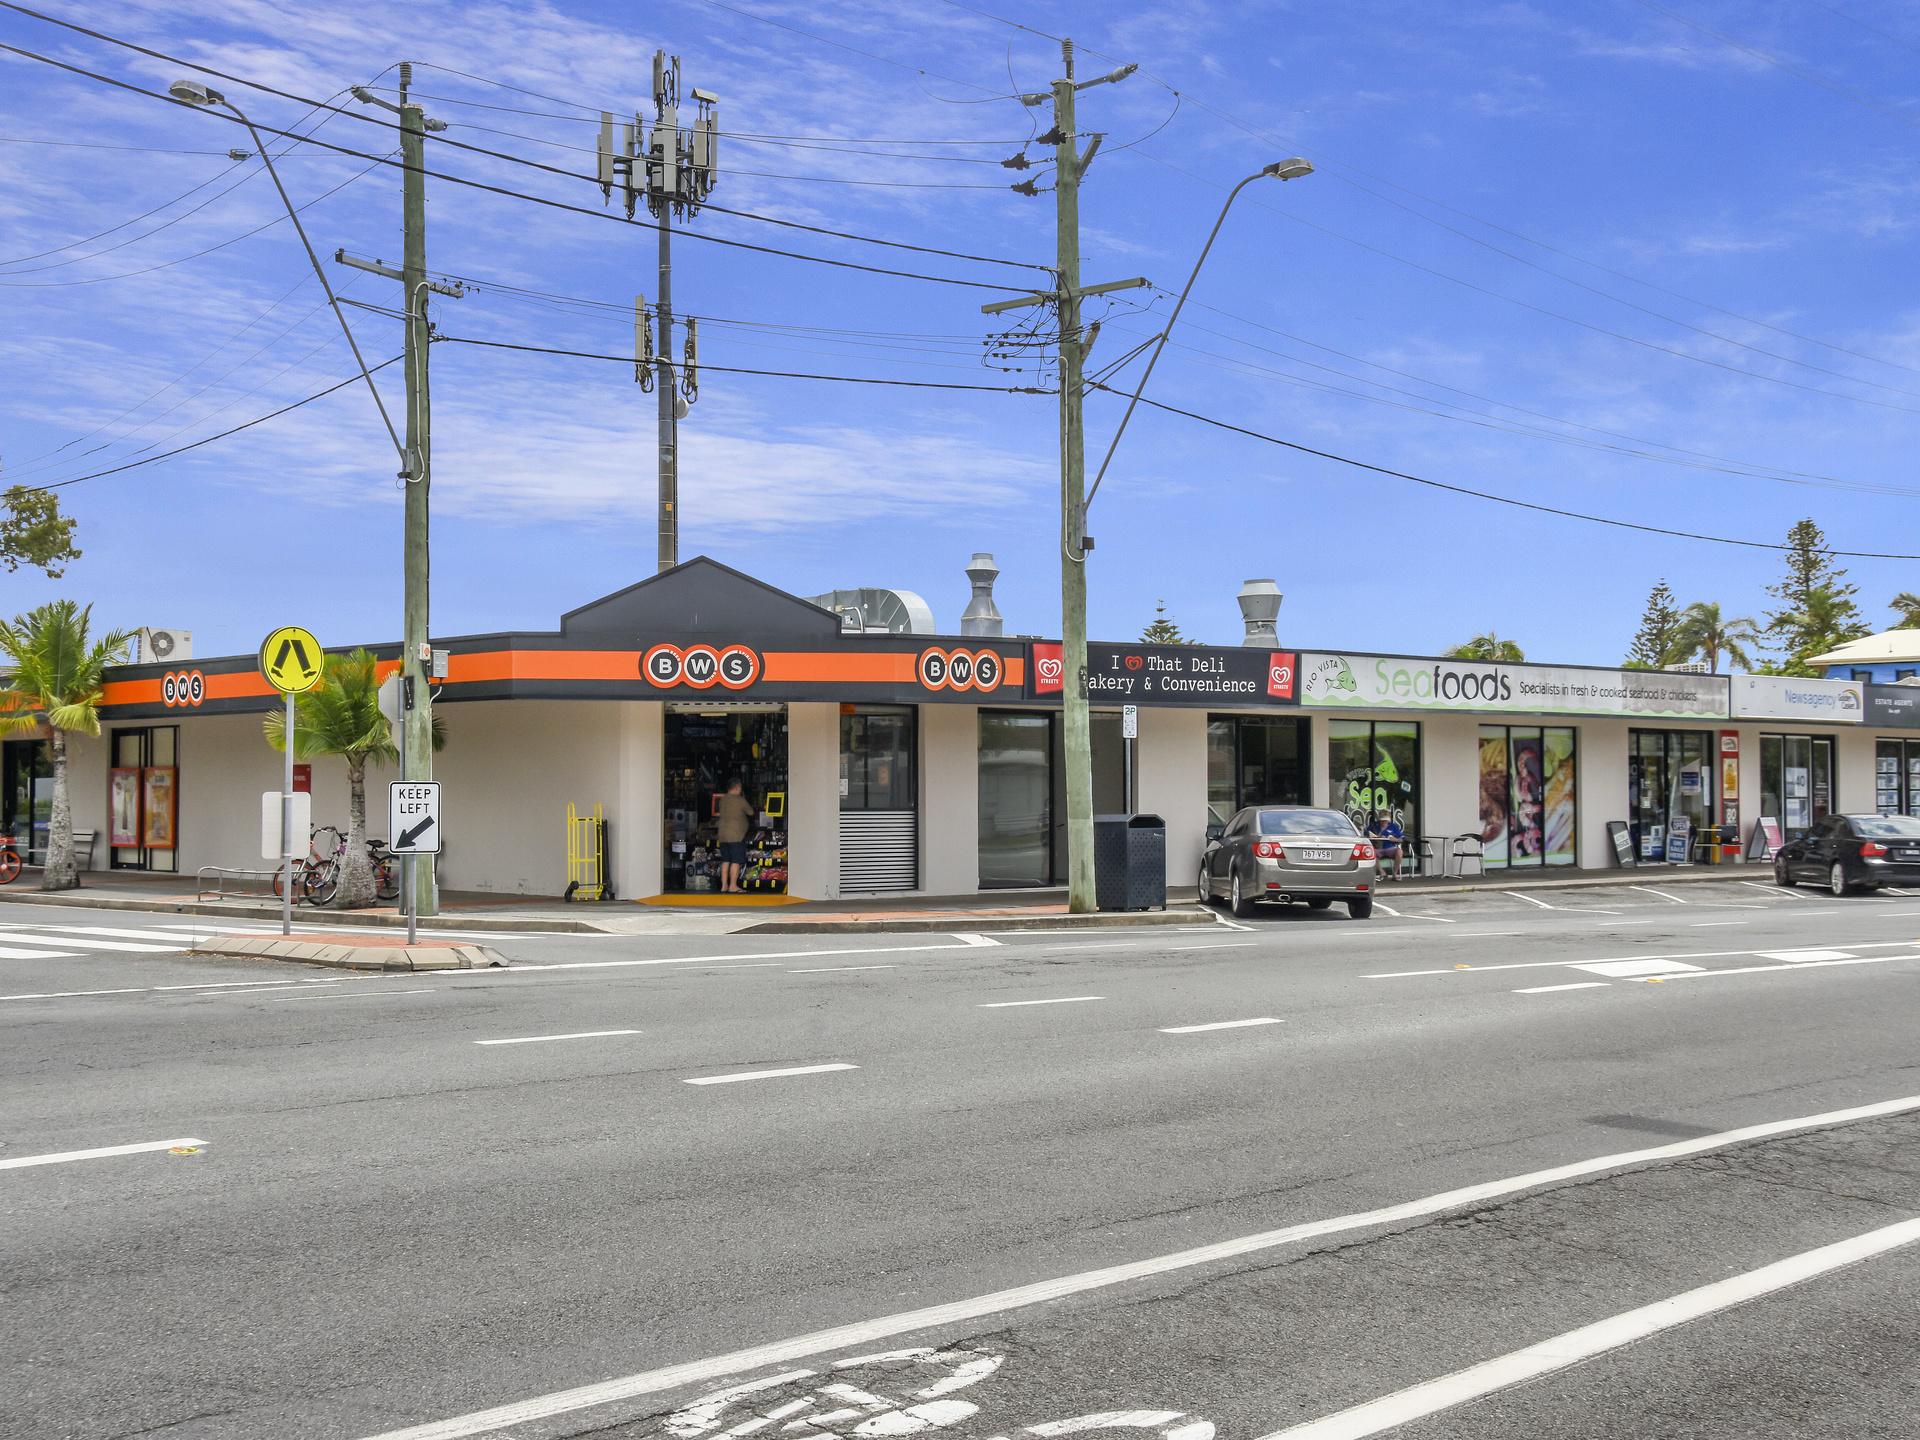 Real Estate | Gold Coast | Chevron Realty | 005 Open2view Id551921 6 1 Kalimna Street